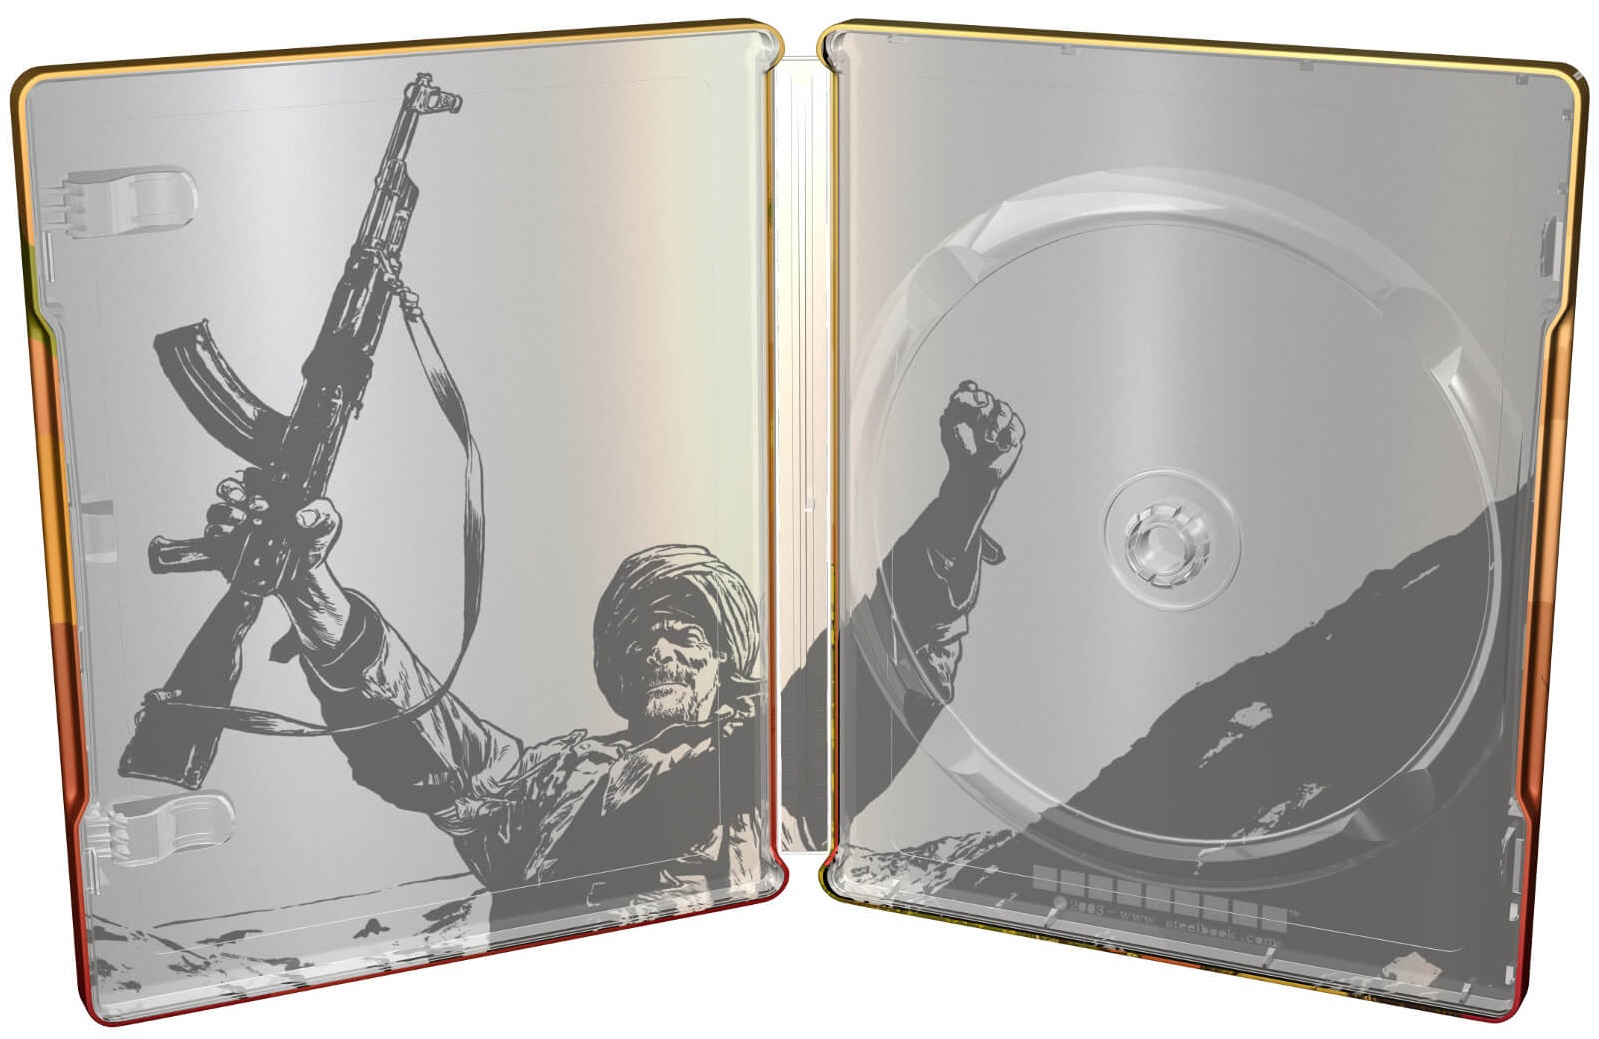 Rambo III SteelBook inside